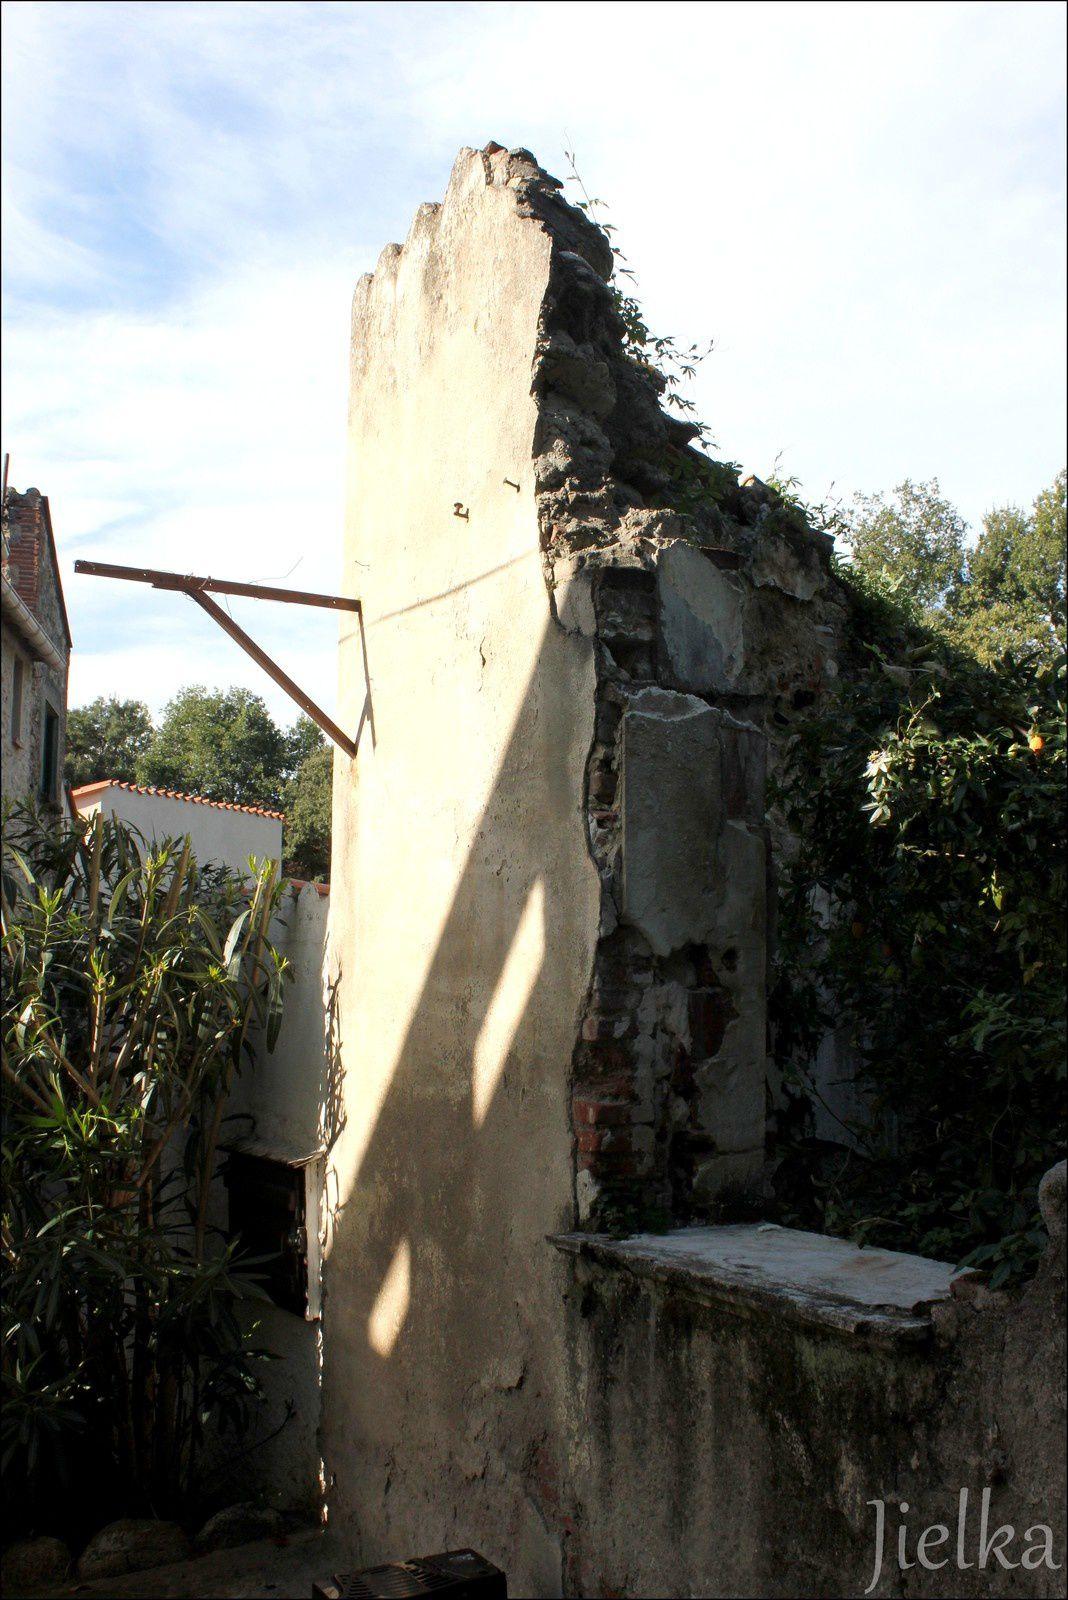 CÉRET (La Costète)